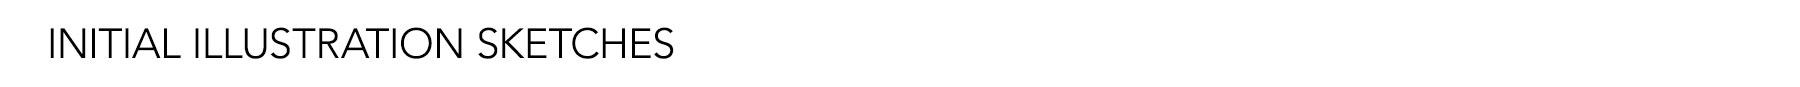 Luxury Branding Design by Ceci New York - Our Muse - Orali Perfume - Logo design, brand illustrations and packaging materials by Ceci New York - orali perfume, wholistic, ceci new york, custom design, luxury design, corporate identity, branding, logo, perfume, bottle design, ceci johnson